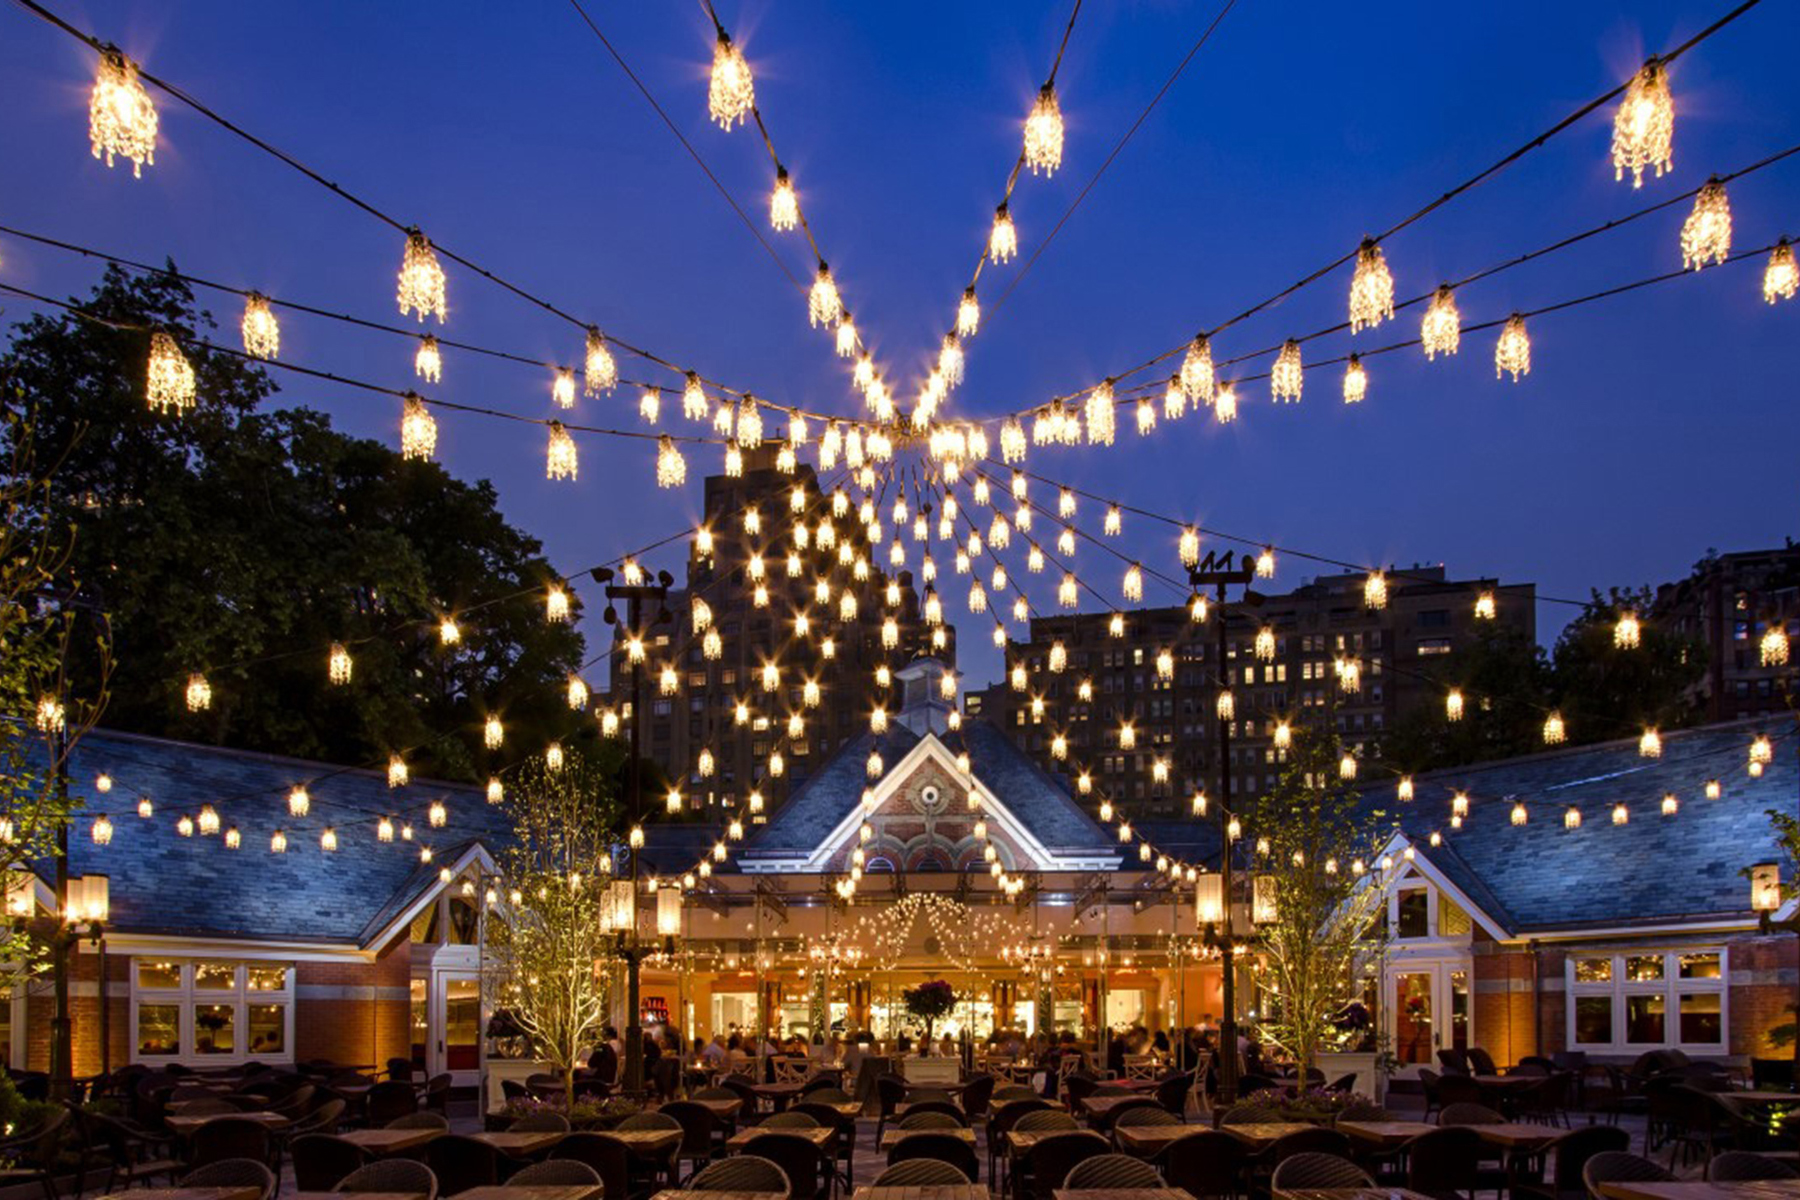 2017 Al Design Awards Tavern On The Green New York